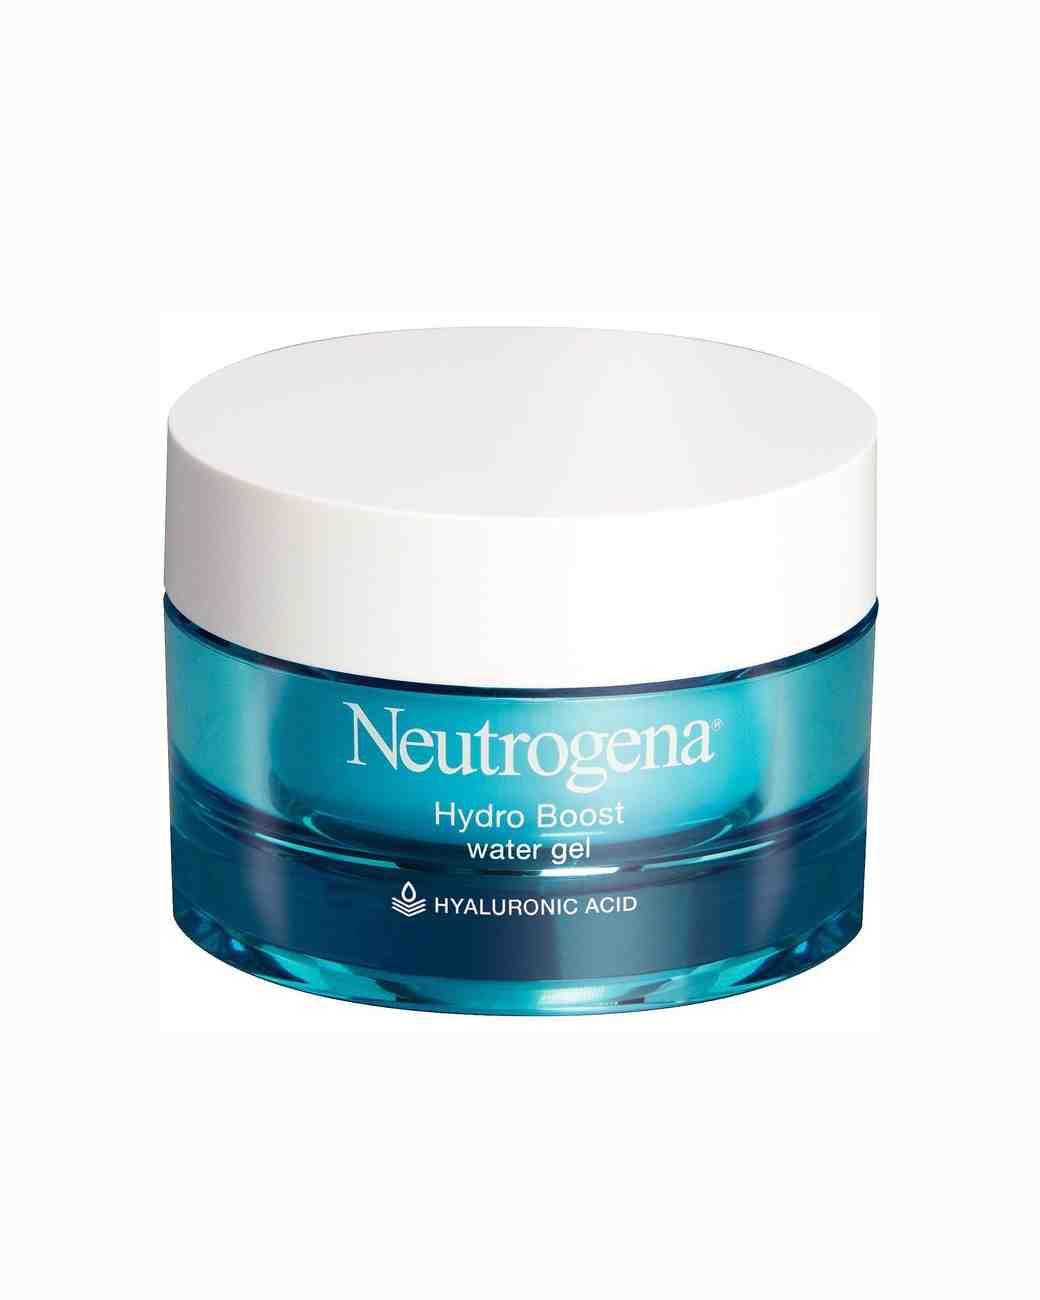 big-day-beauty-awards-neutrogena-hydro-boost-water-gel-0216.jpg